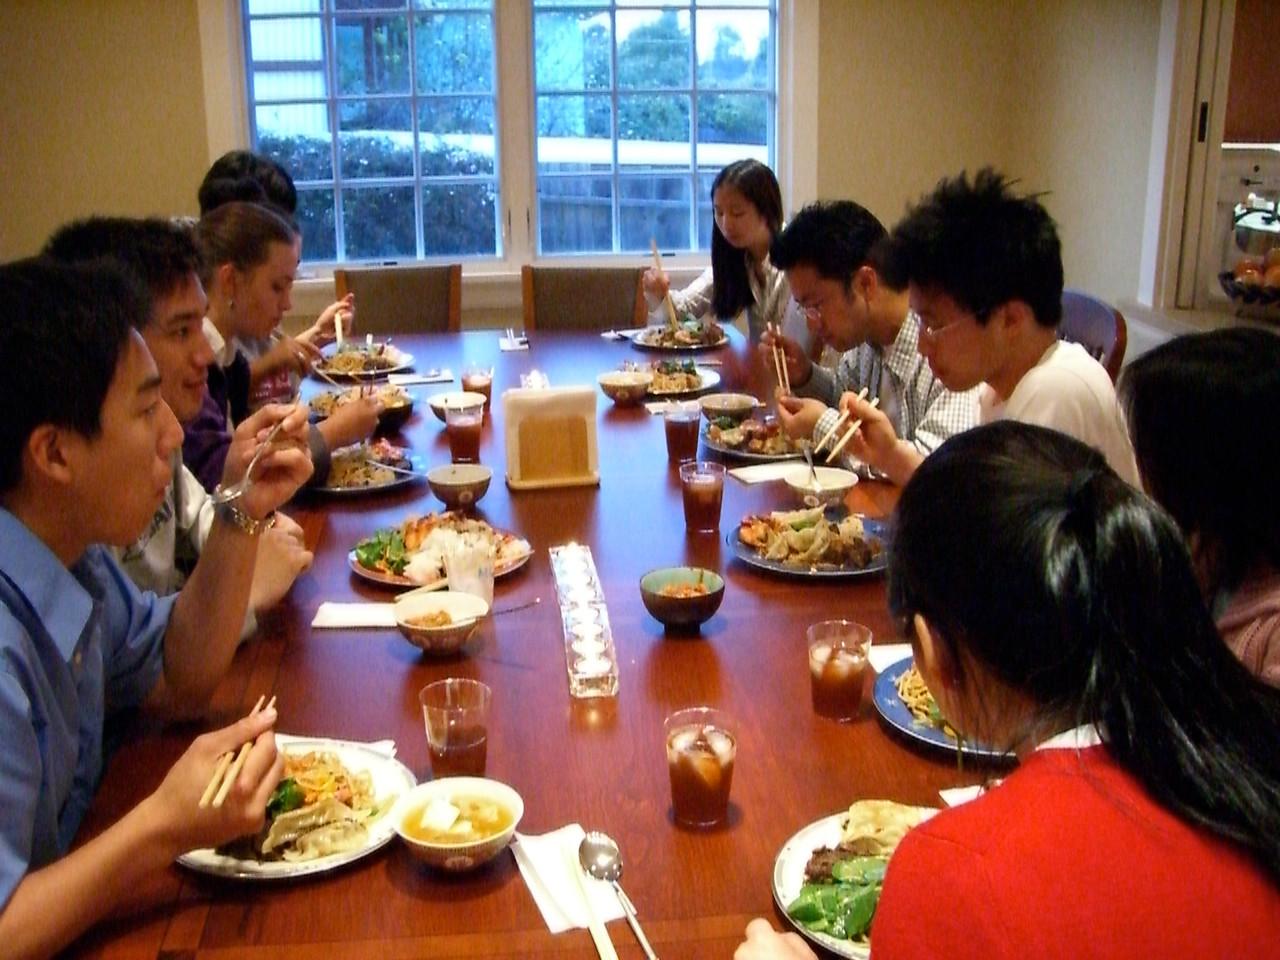 2006 04 23 Sun - Tmony @ The Kim's for dinner 1